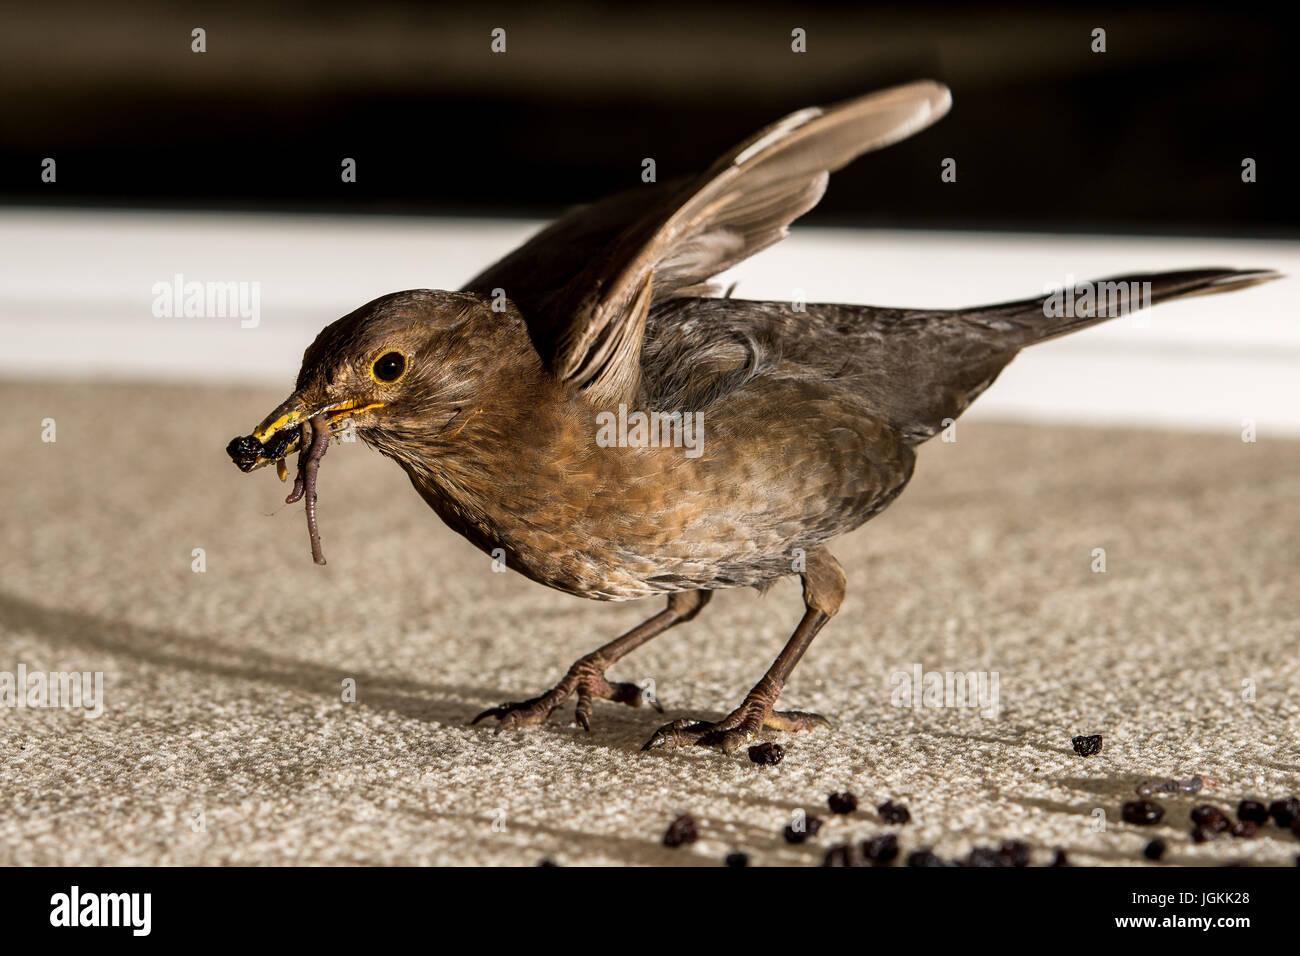 Blackbird collecting food - Stock Image